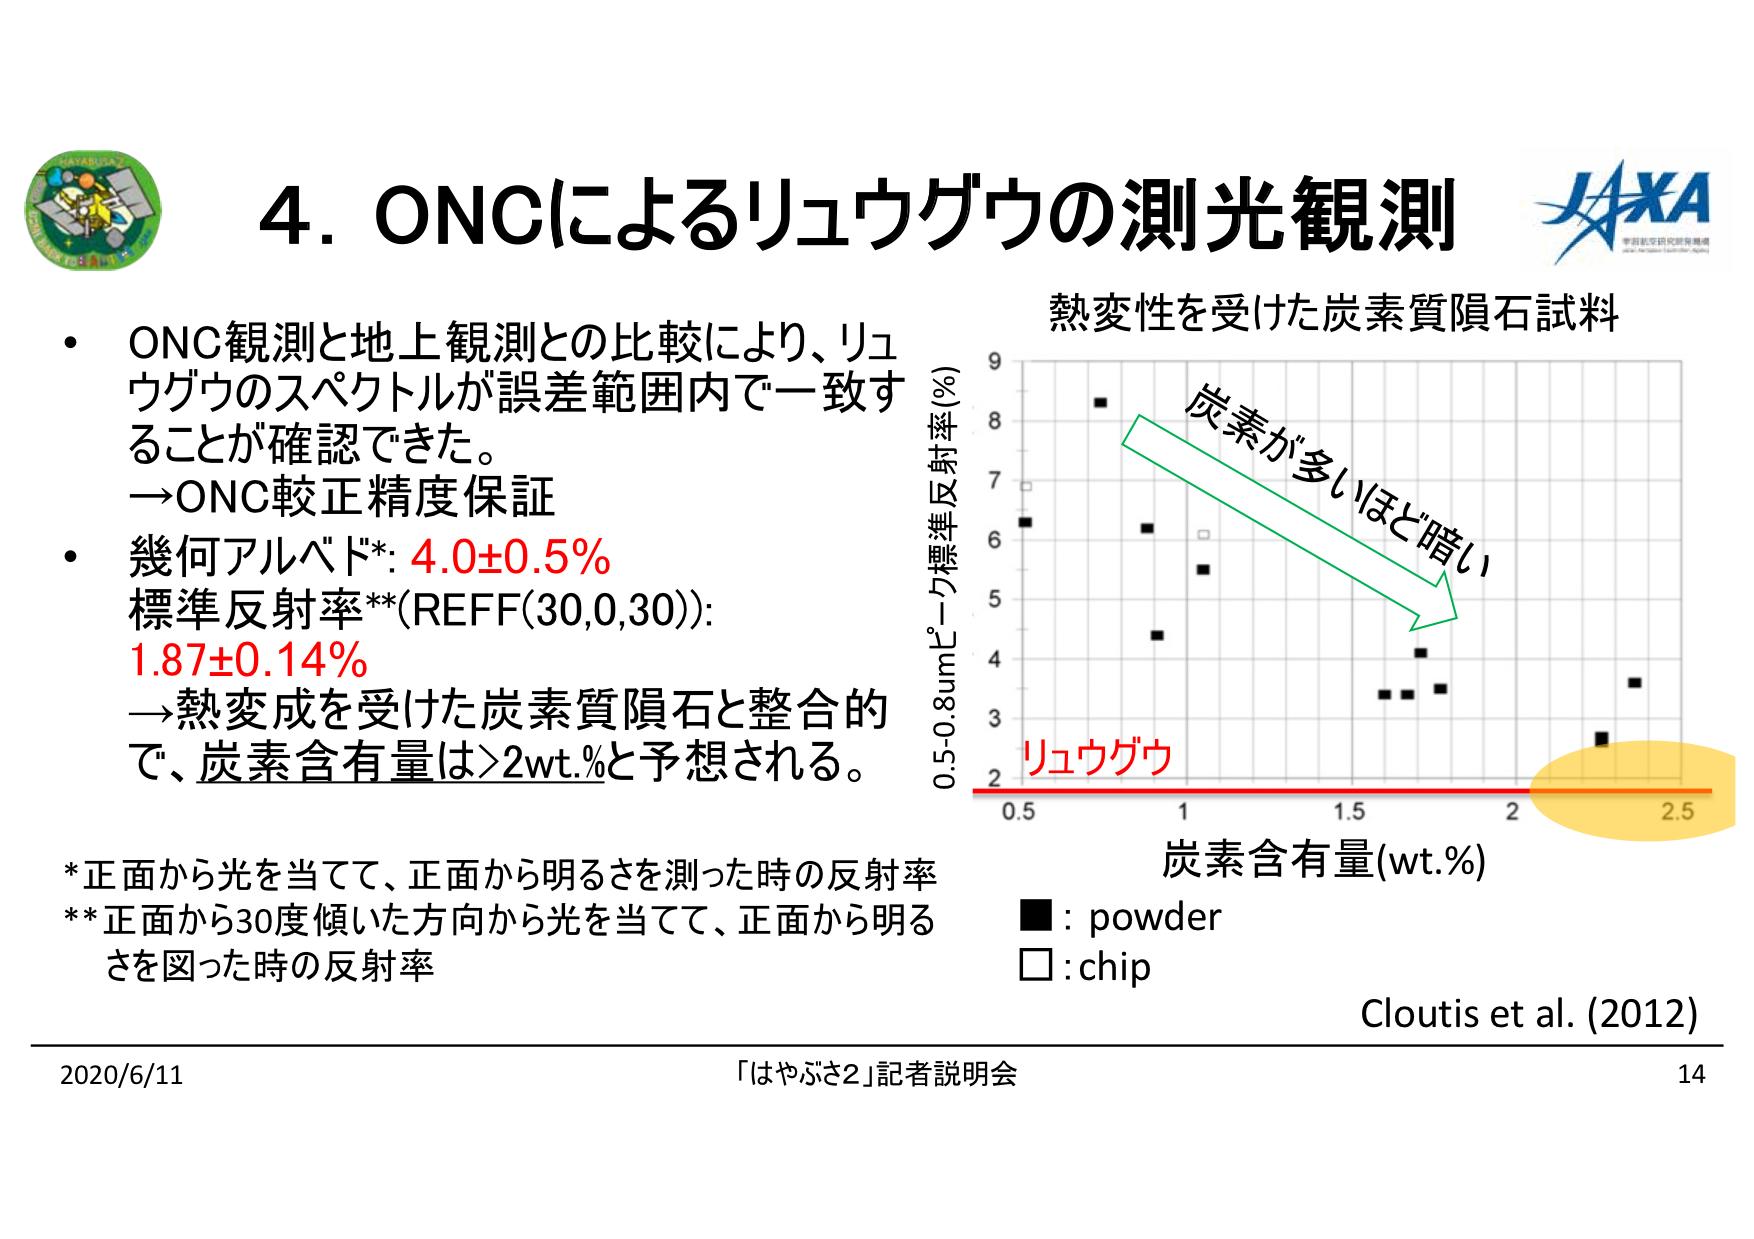 f:id:Imamura:20200611094607p:plain